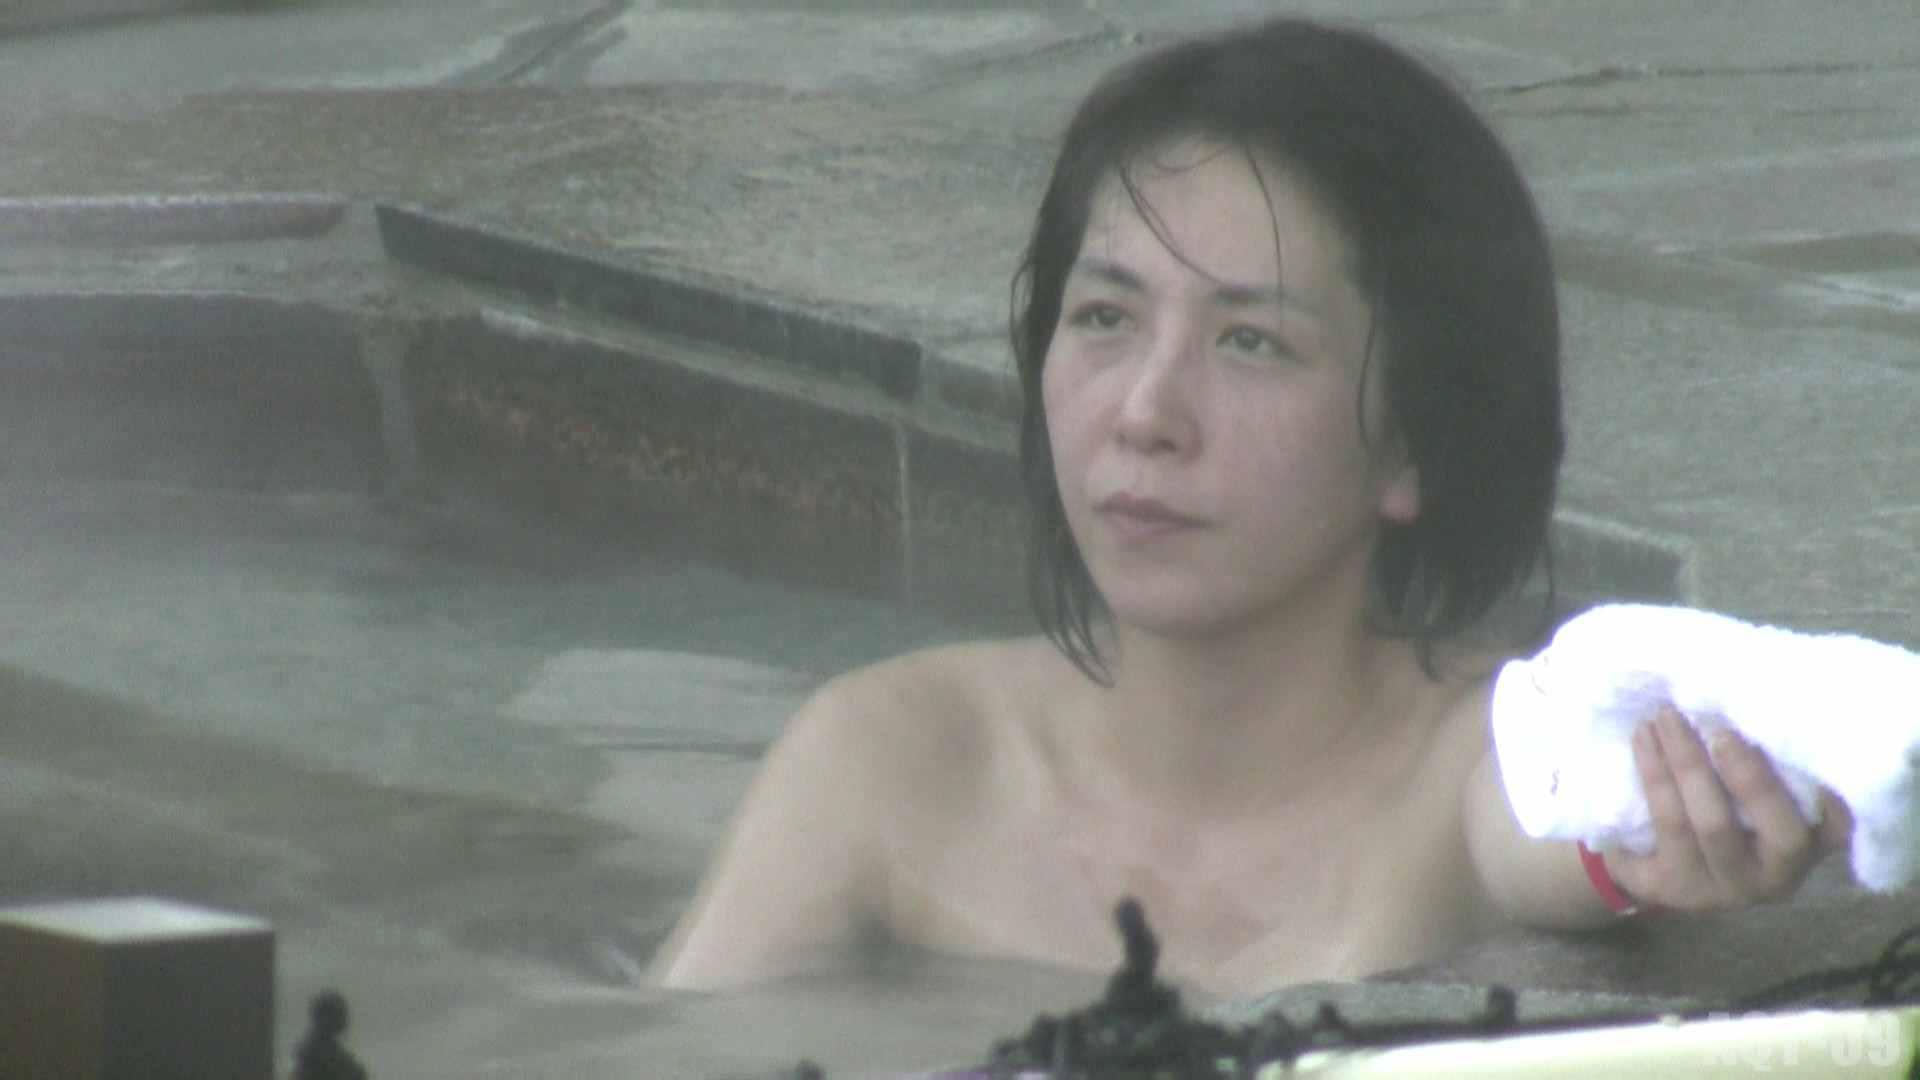 Aquaな露天風呂Vol.788 盗撮シリーズ | 露天風呂編  105PIX 41